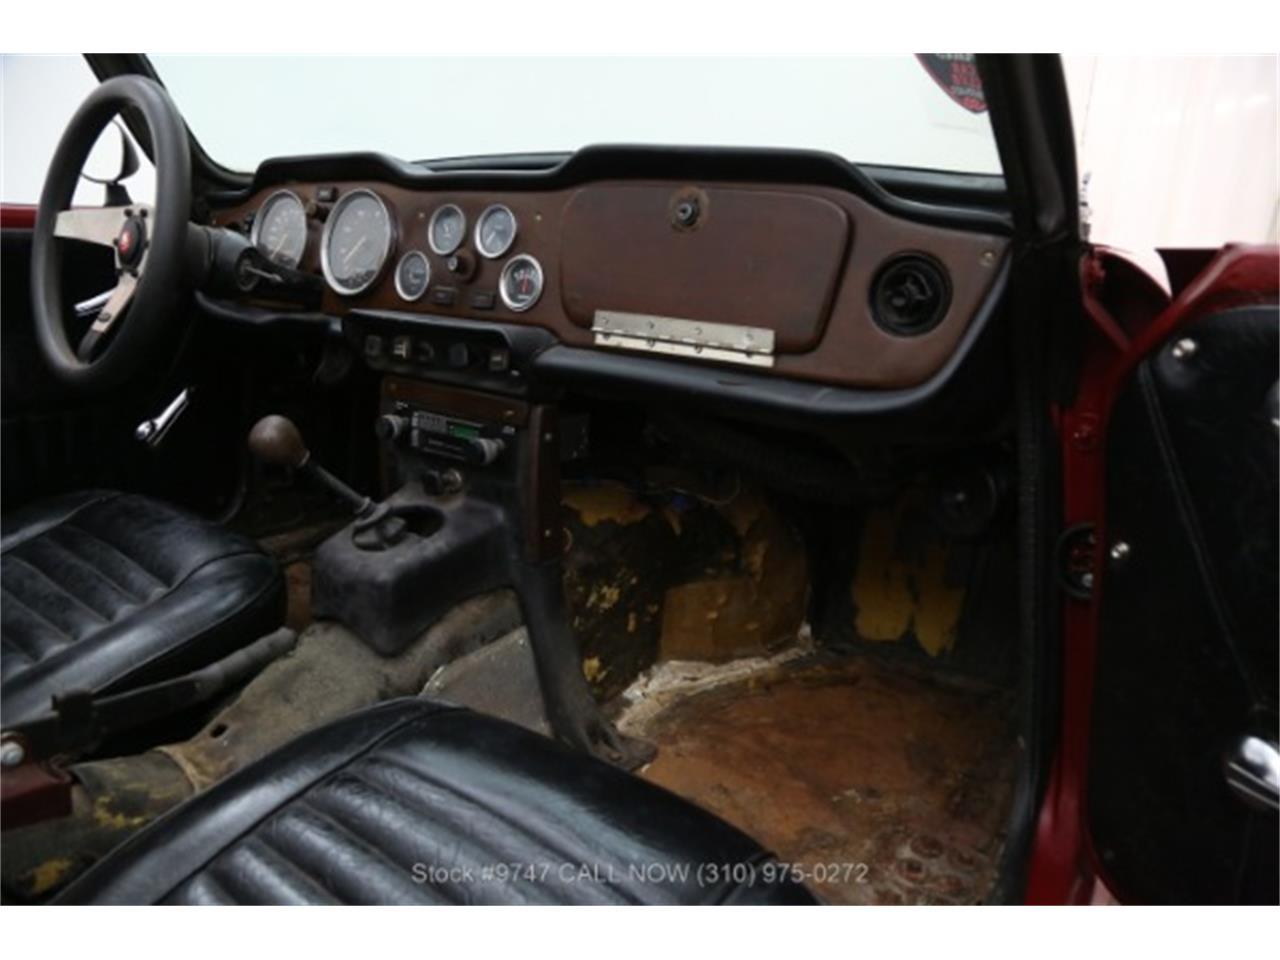 Large Picture of Classic '73 Triumph TR6 - $3,950.00 - QI3K